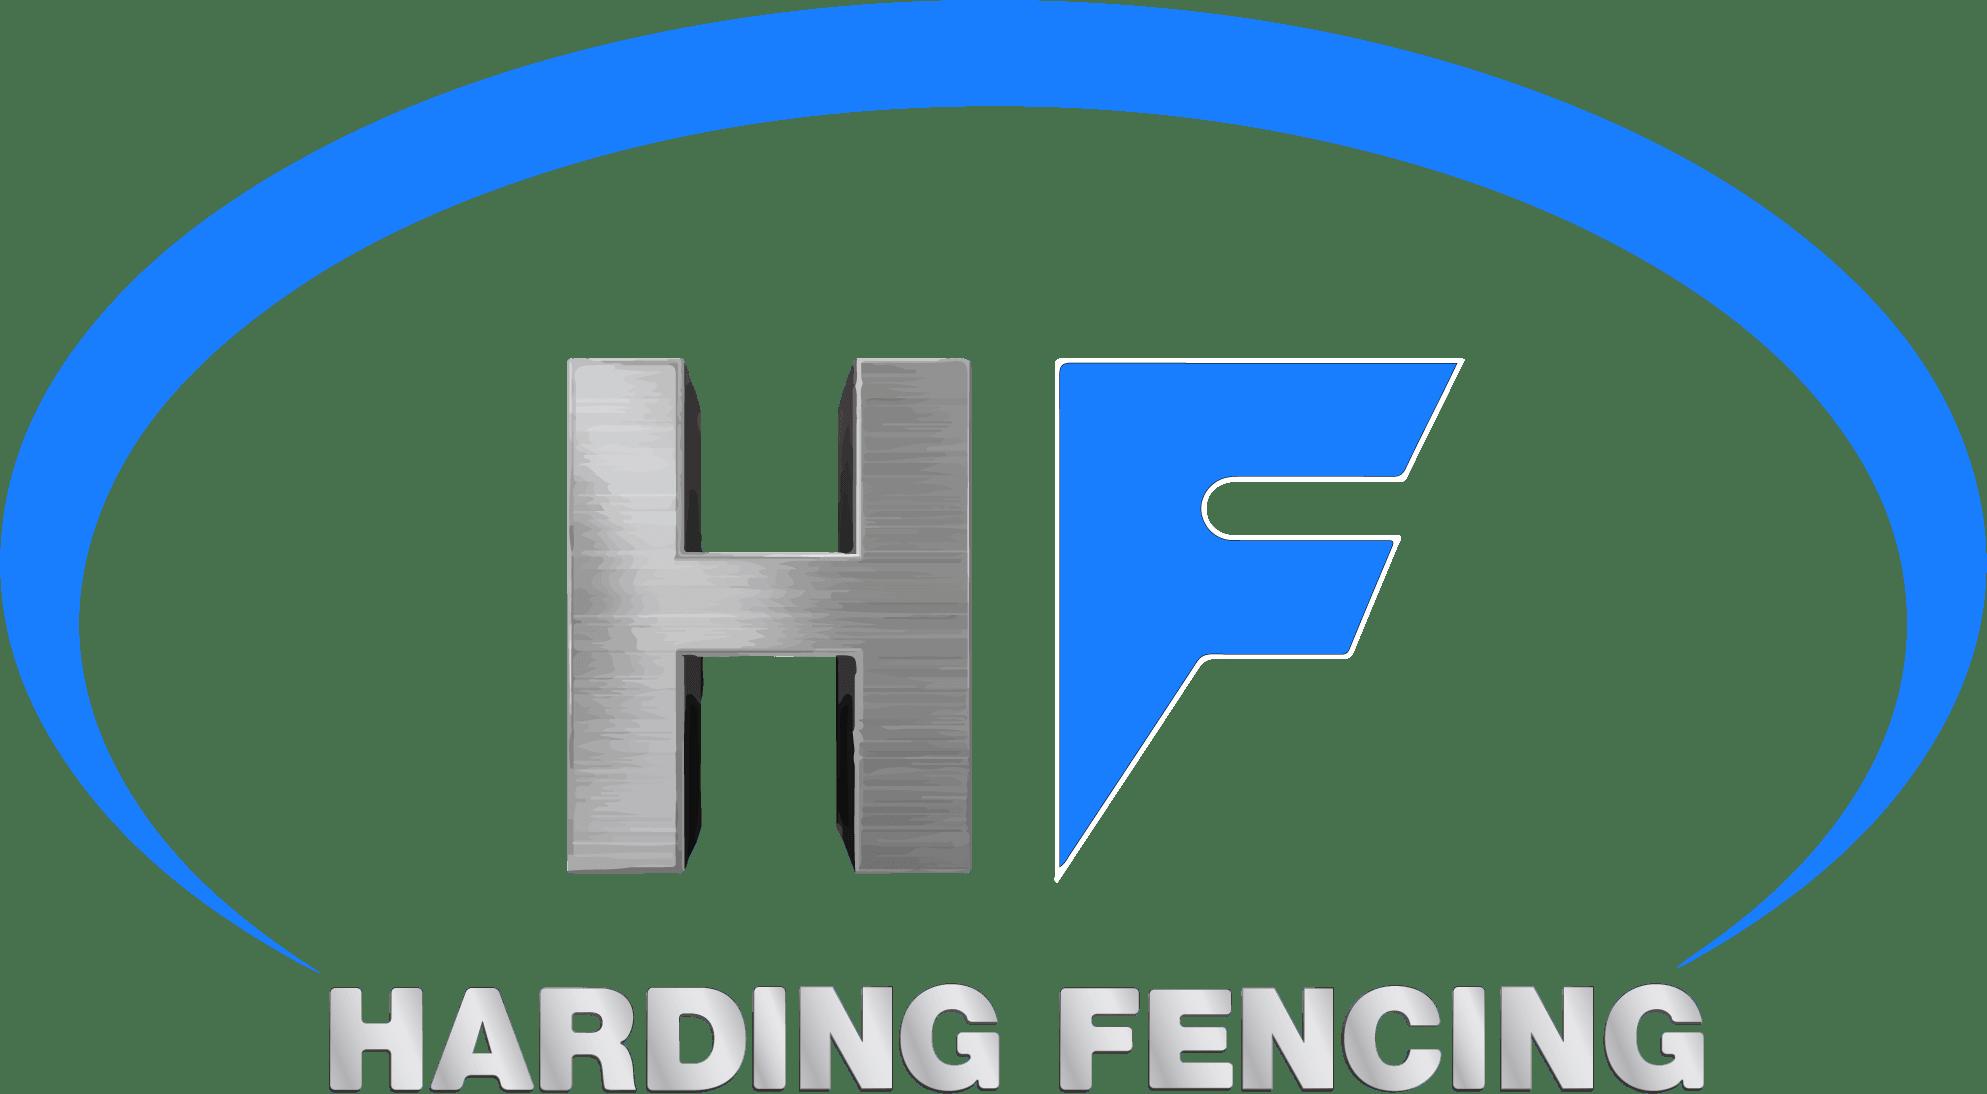 Harding Fencing